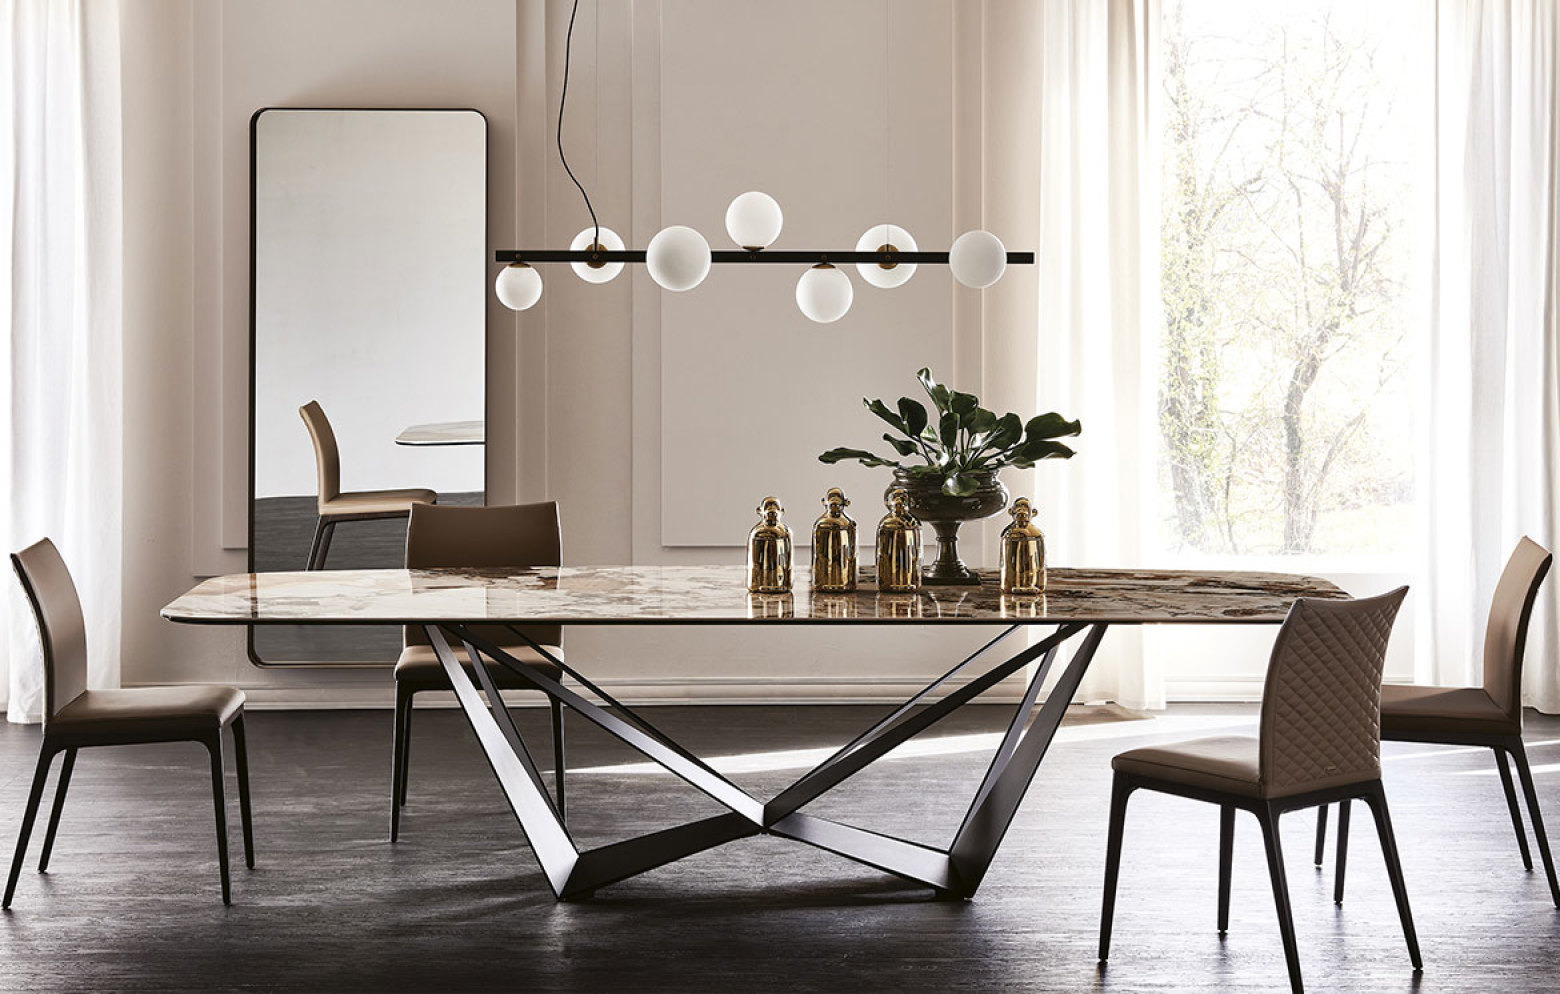 skorpio keramik esstische tische st hle who 39 s perfect. Black Bedroom Furniture Sets. Home Design Ideas